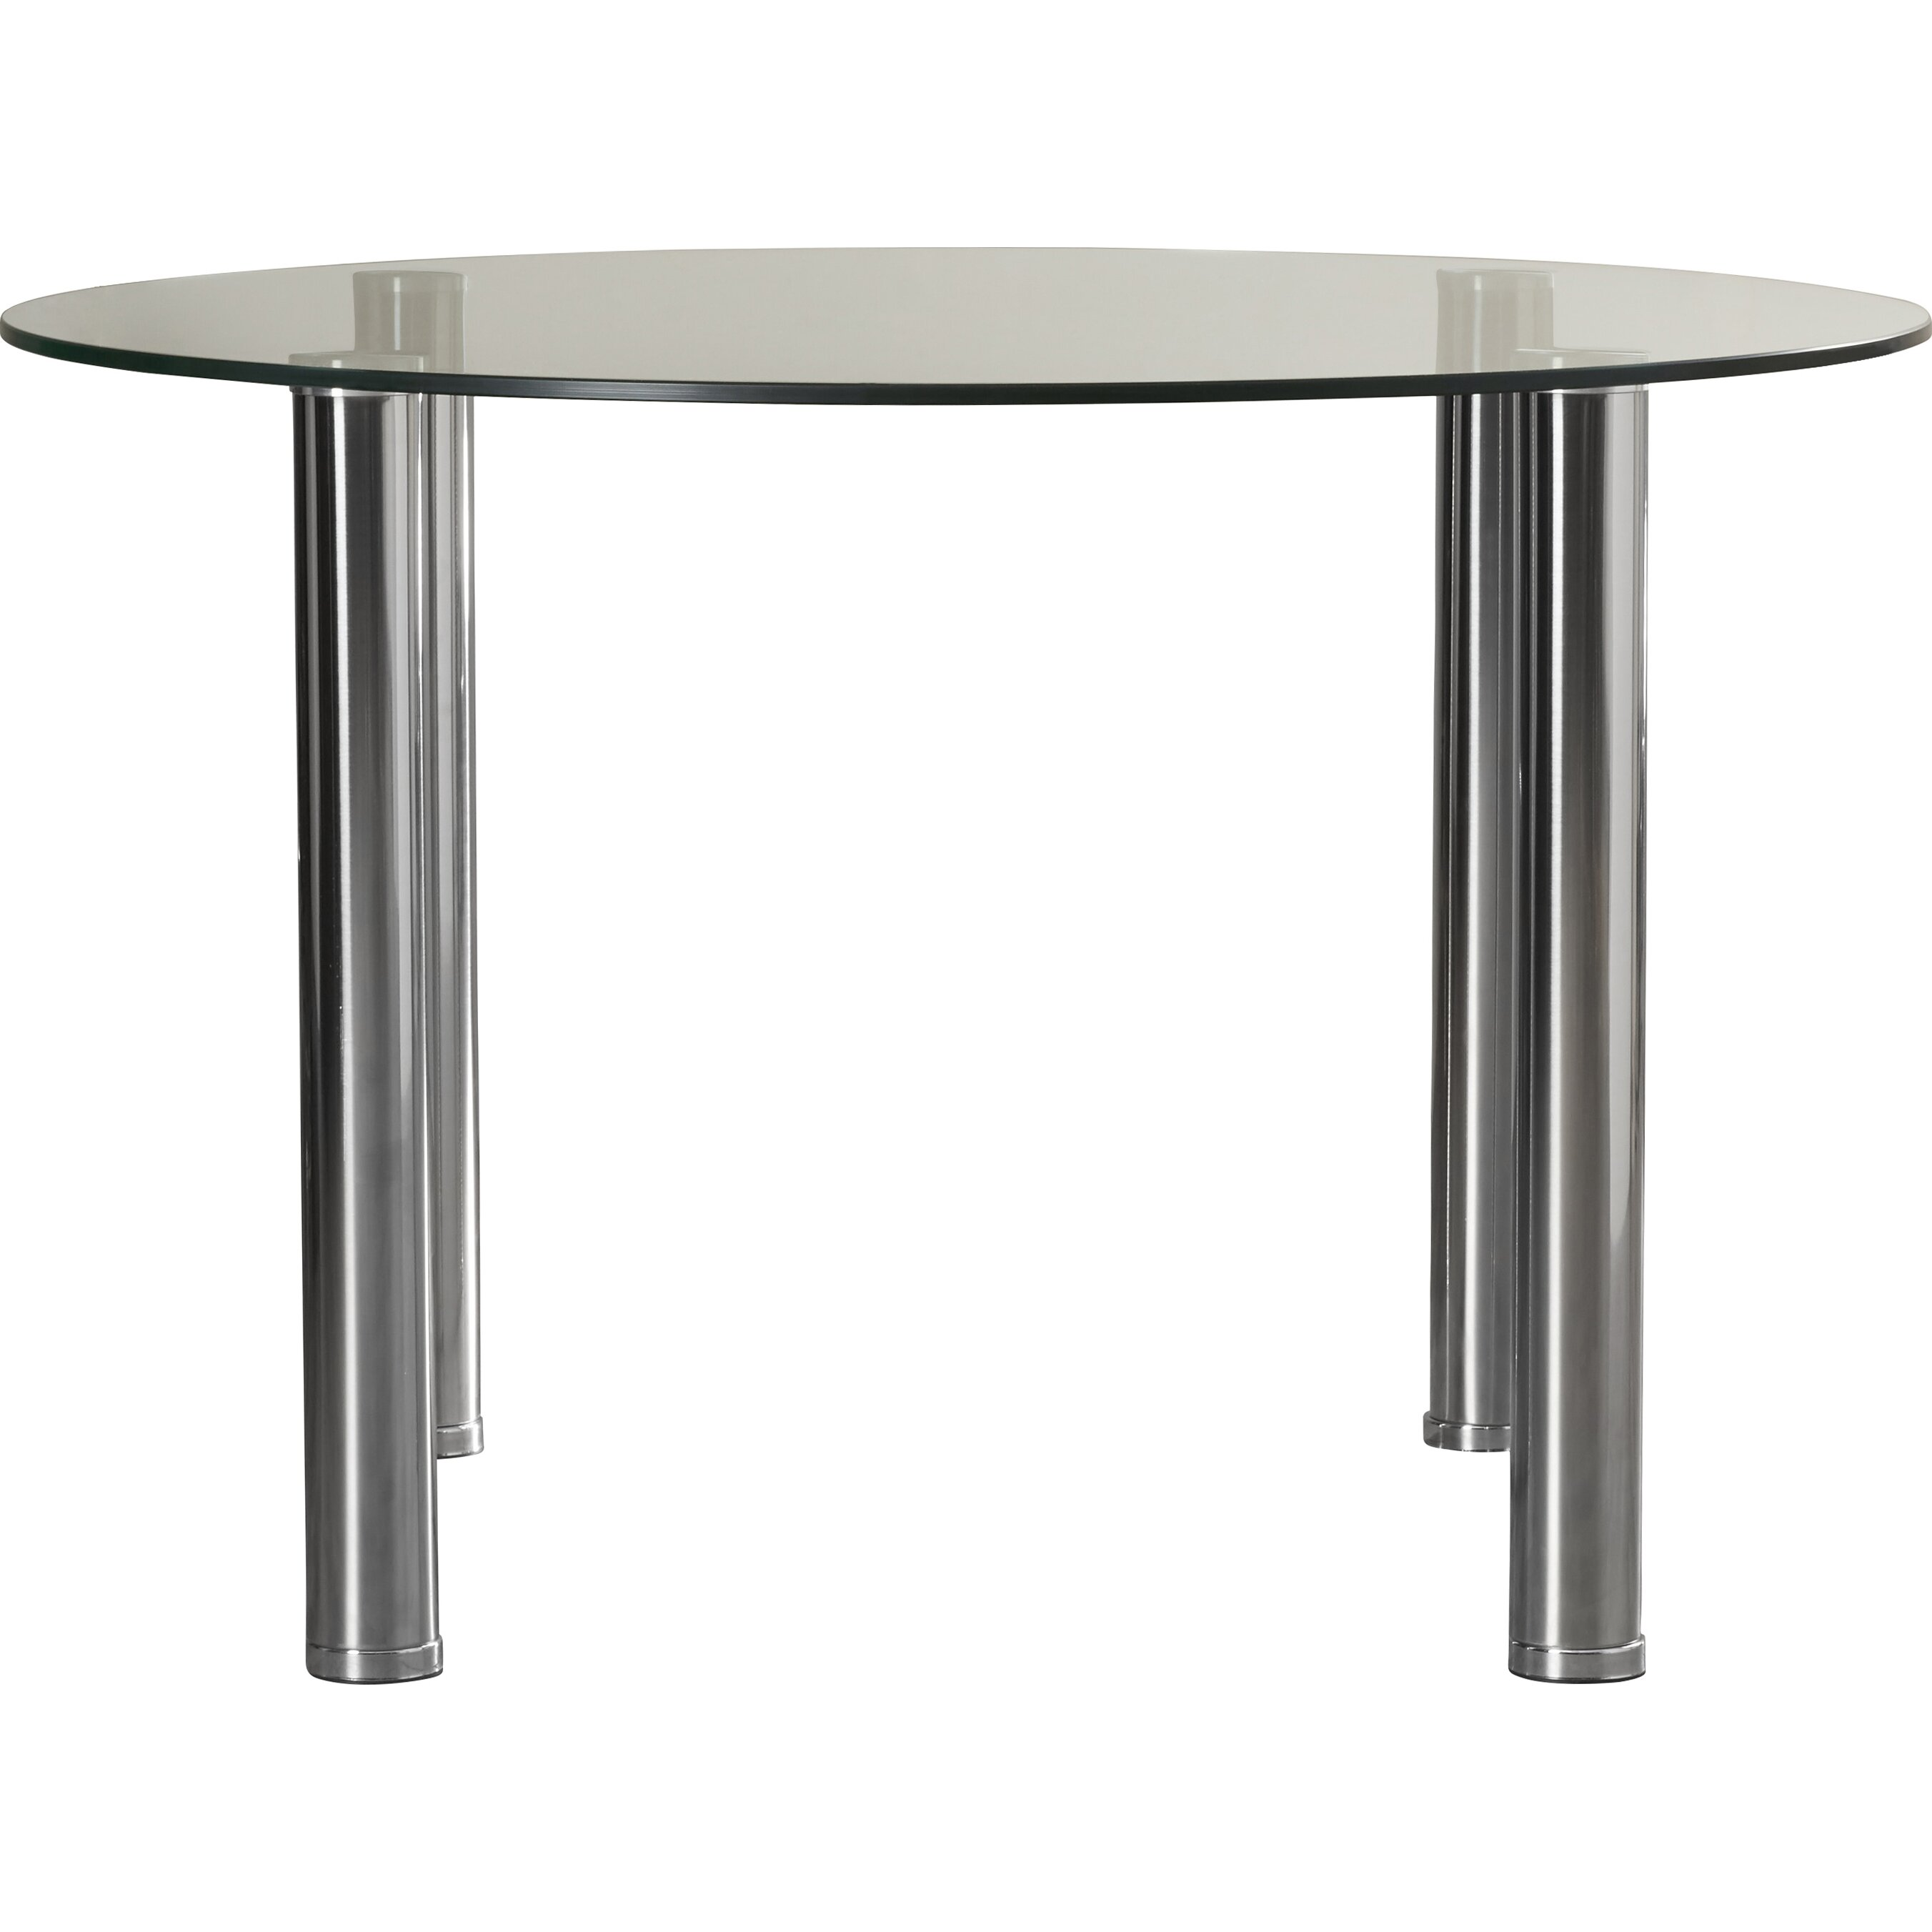 Hokku designs narbo 5 piece dining set reviews for Hokku designs dining room furniture